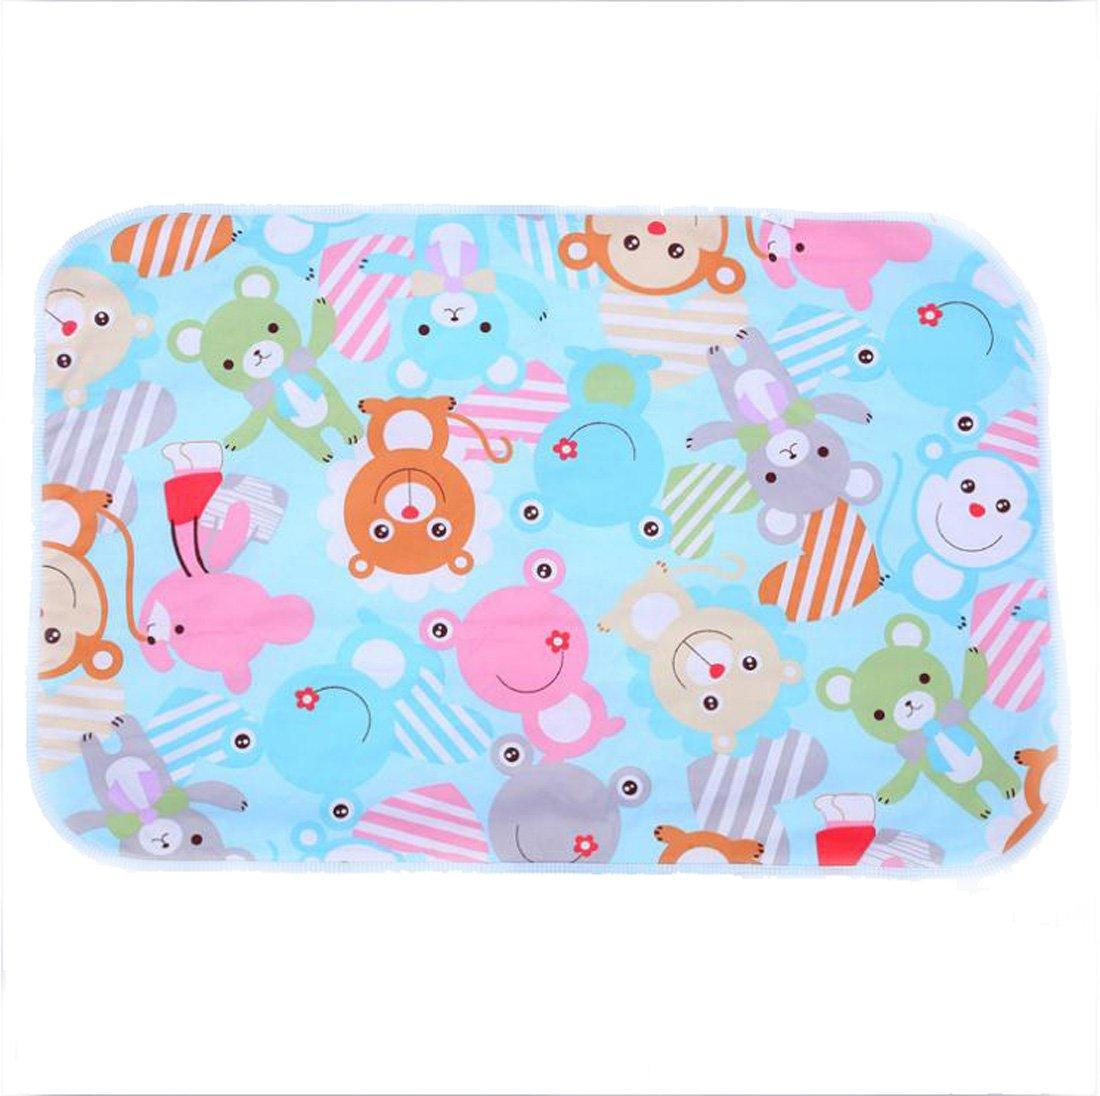 Multifit Cute Cartoon Changing Mat Breathable Waterproof Underpads Mattress Pad Sheet Protector(Fish)